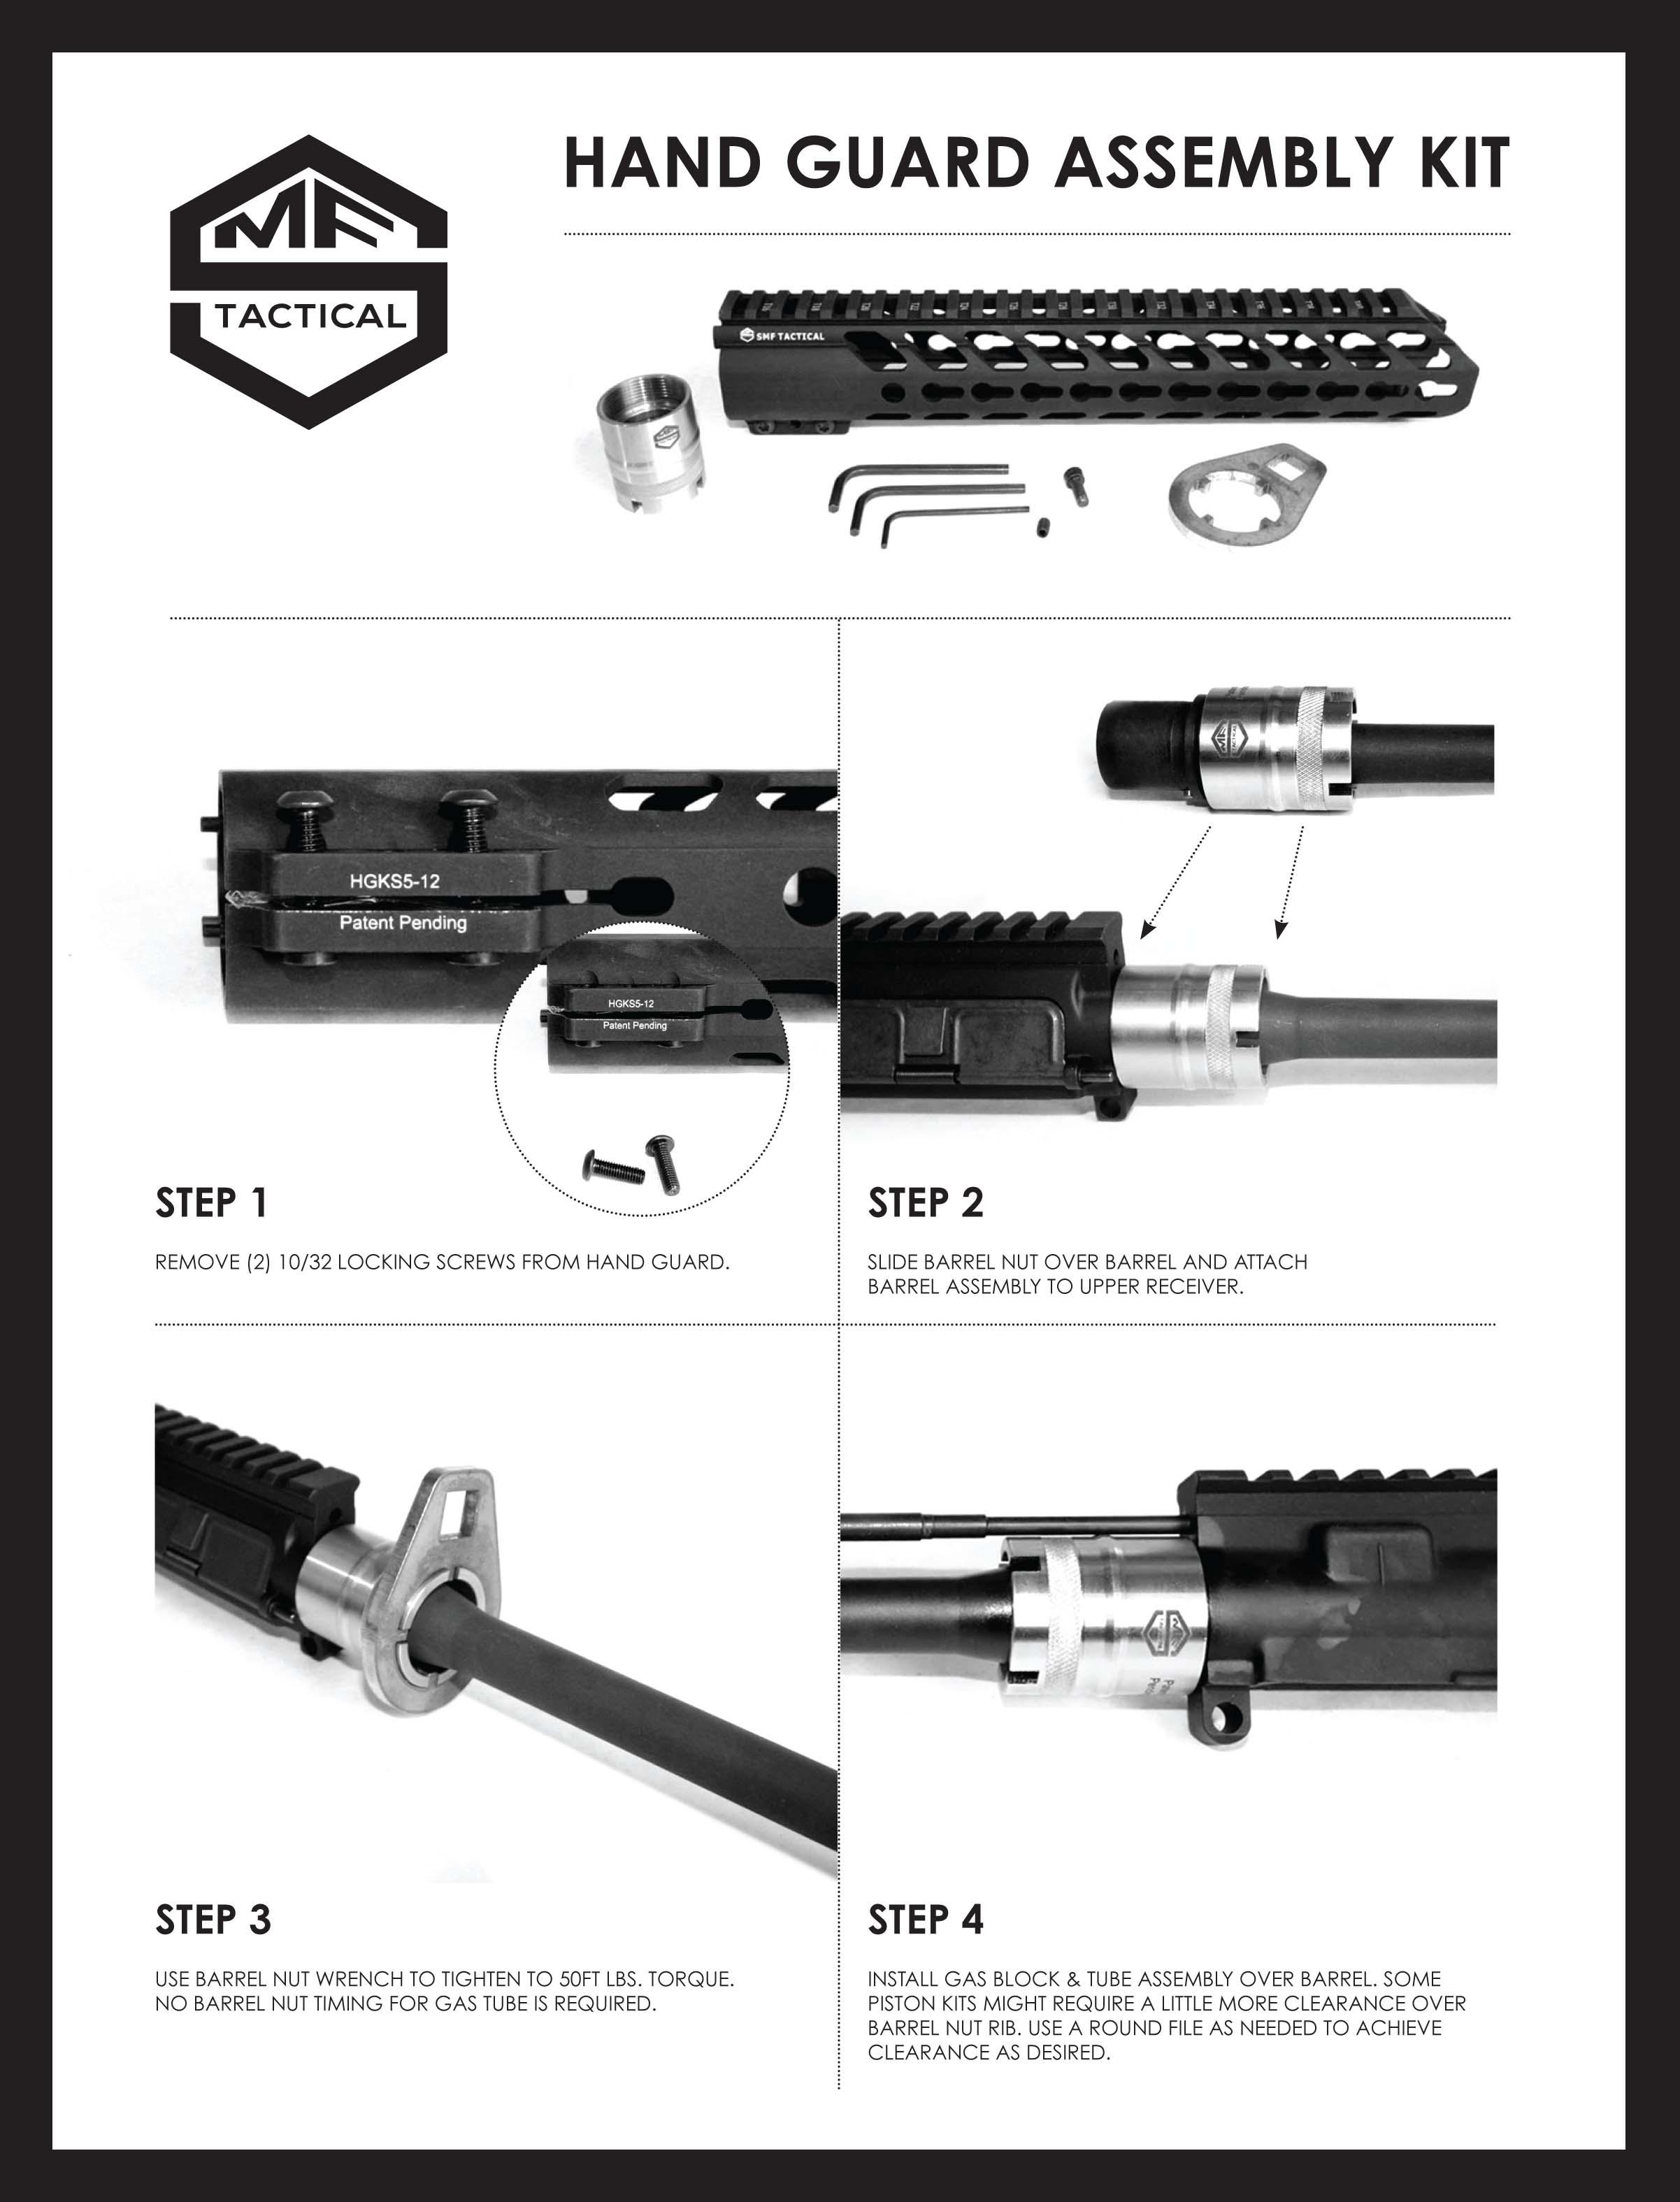 good-handguard-assembly-kit-instructions-1.jpg